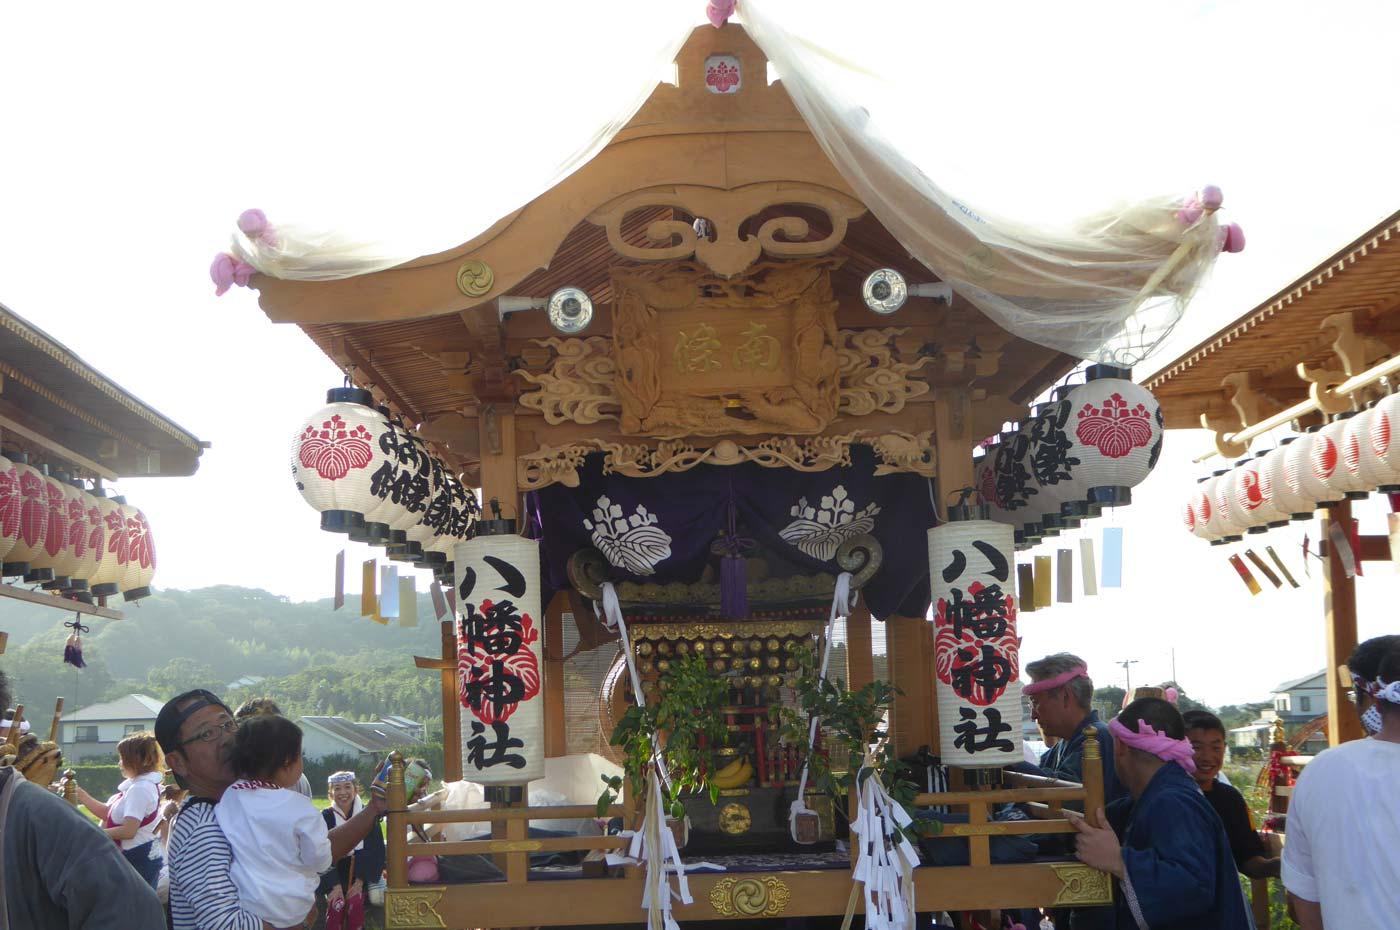 南条地区八幡神社の屋台